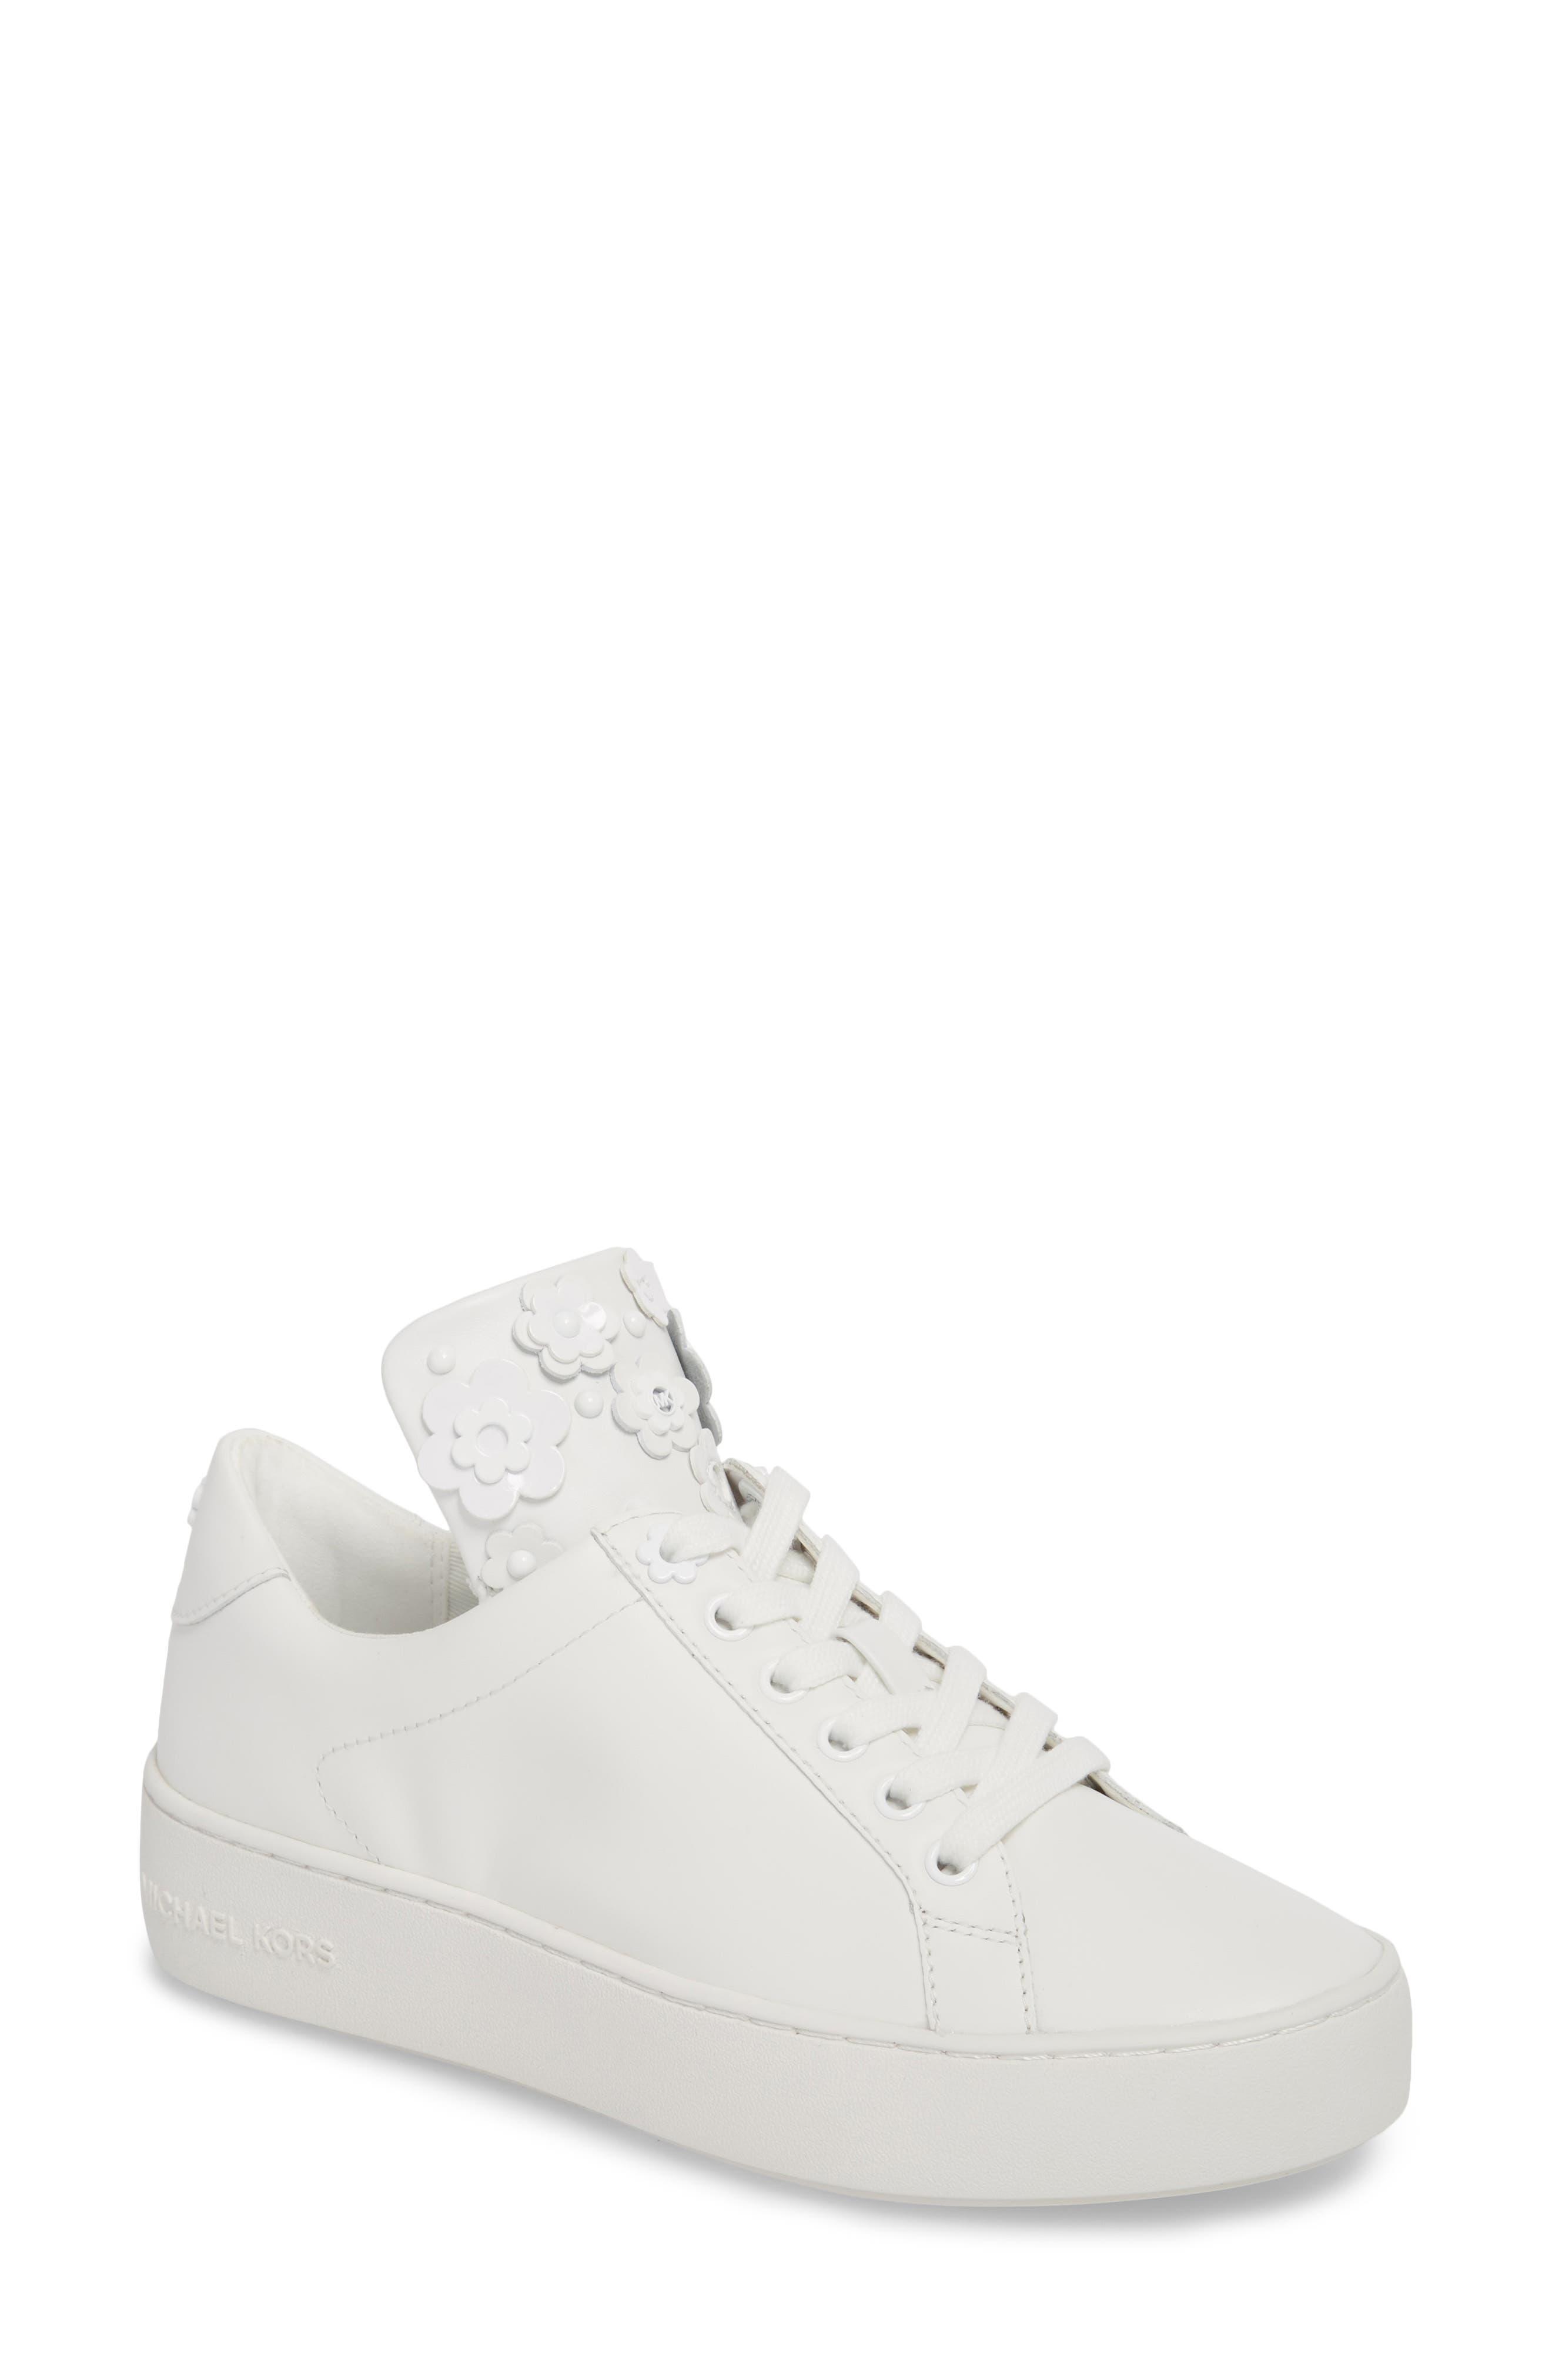 Mindy Platform Sneaker,                         Main,                         color, Optic White